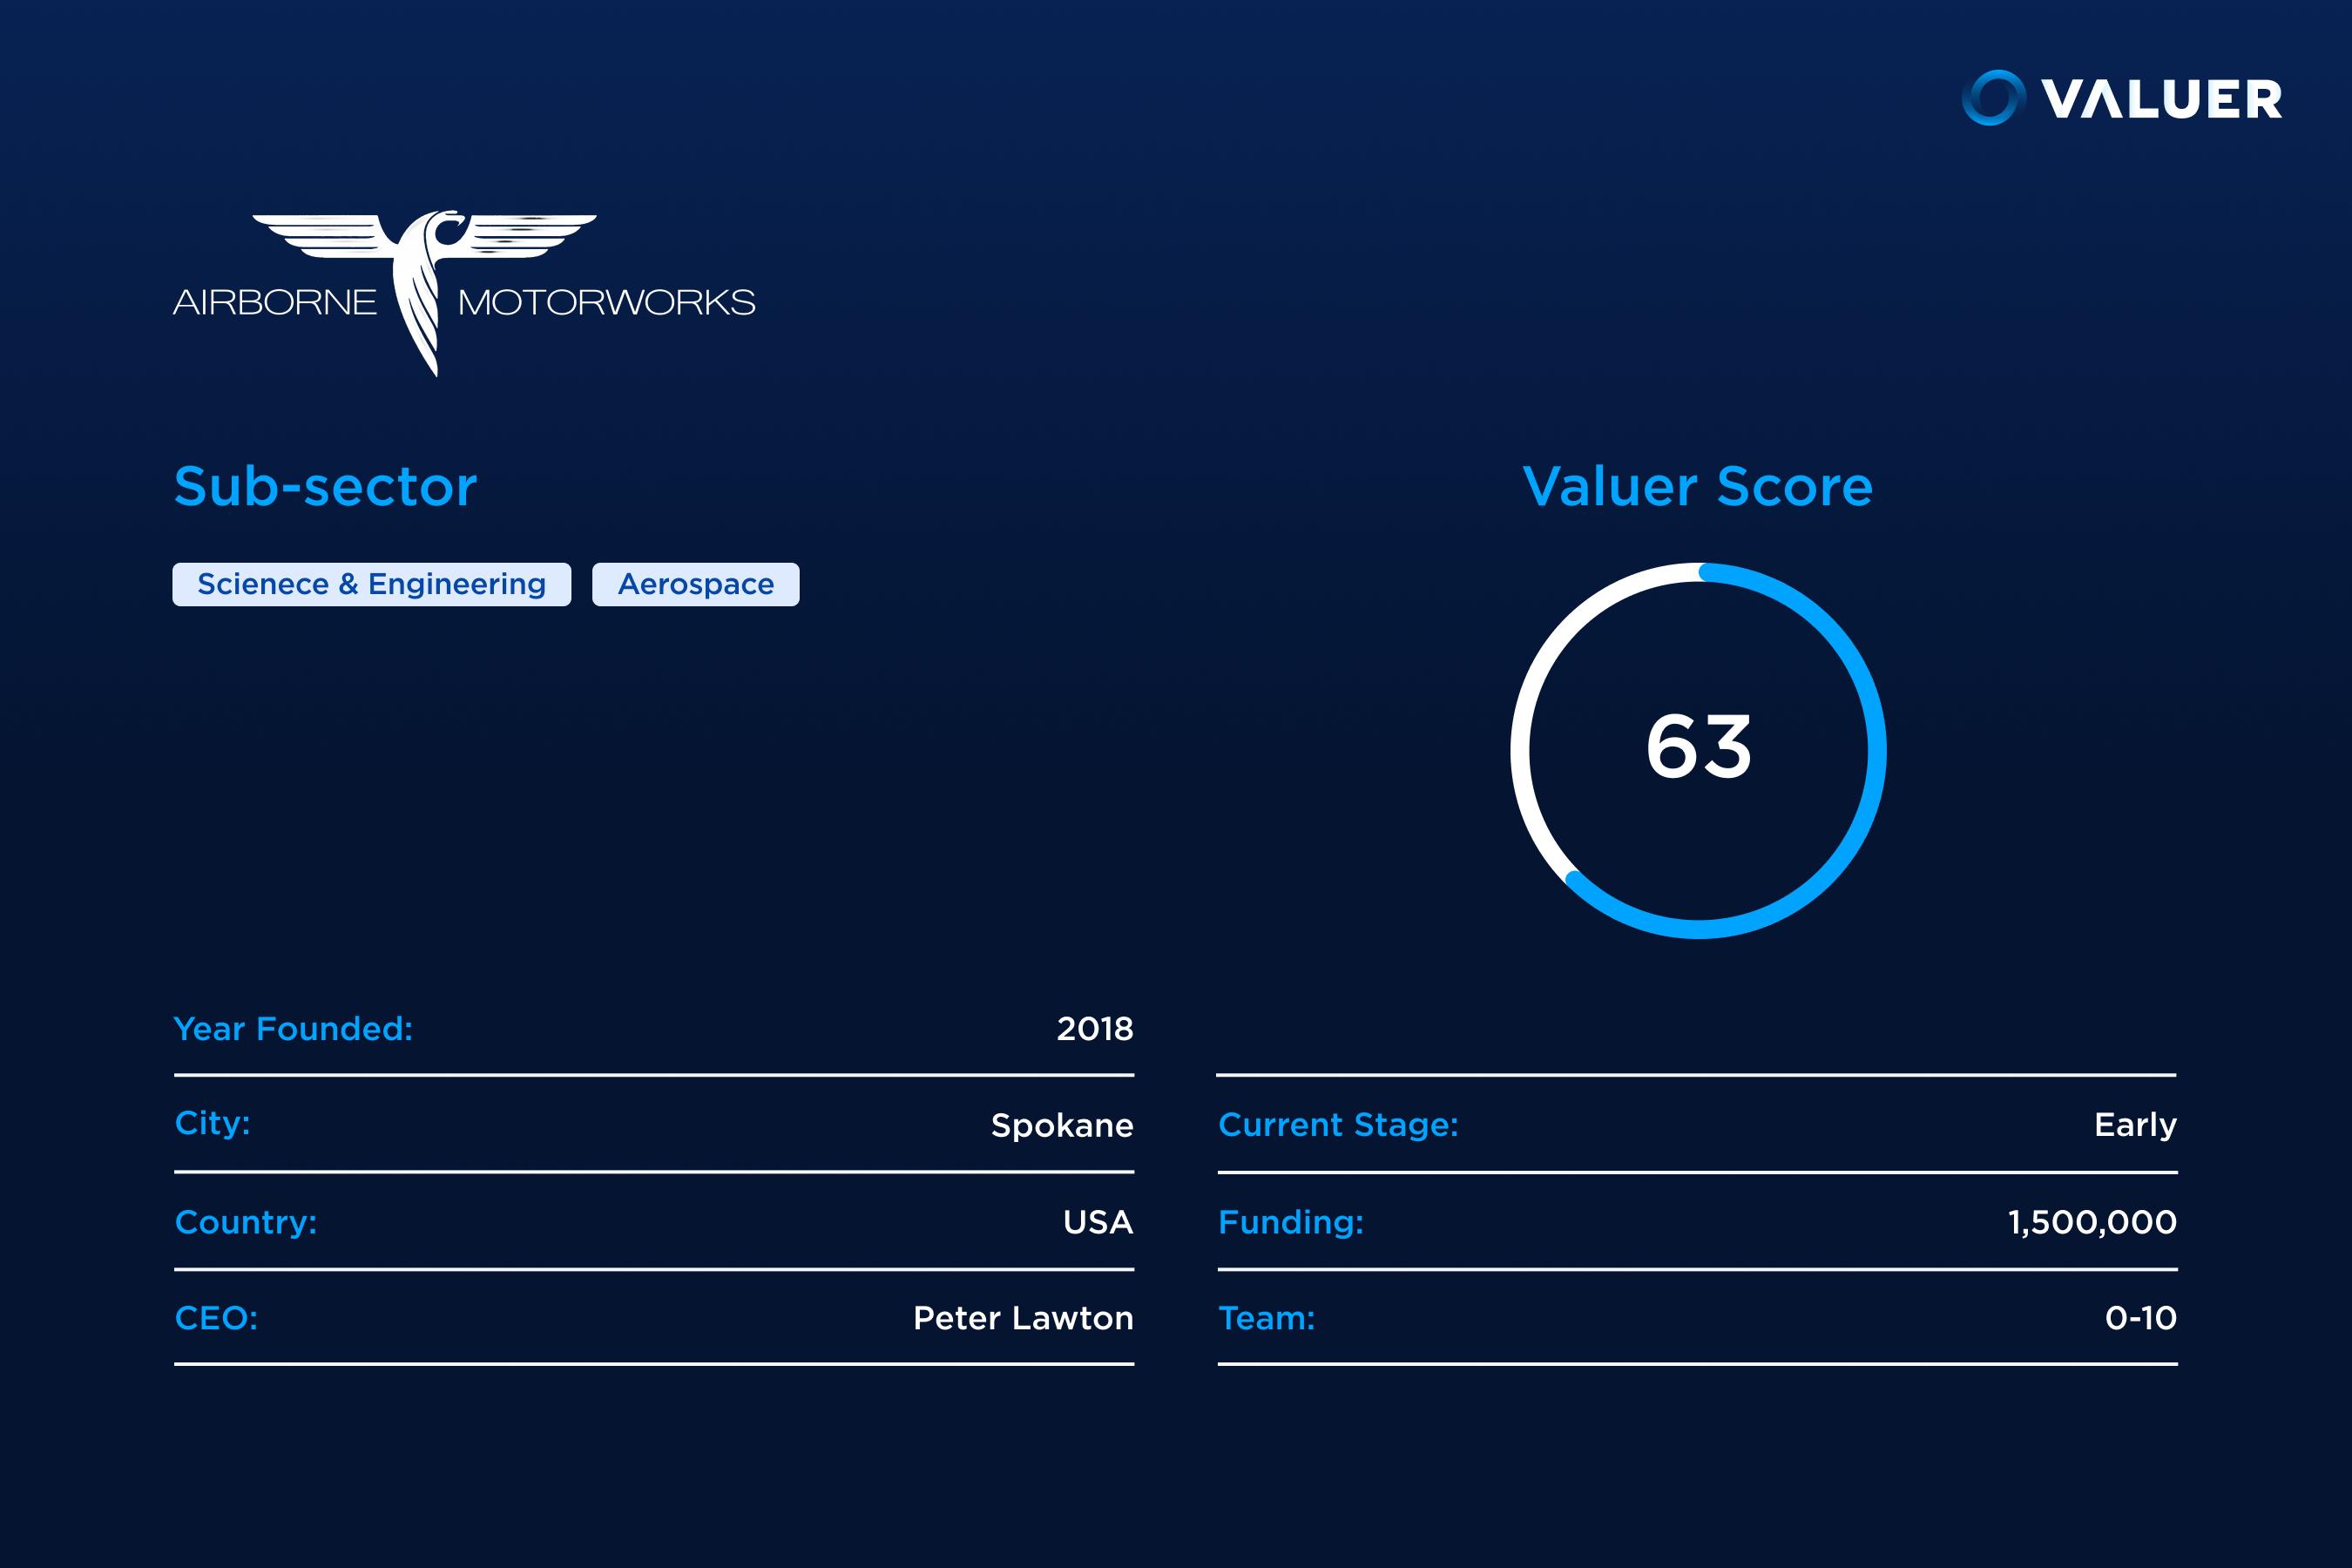 Airborne Motorworks score